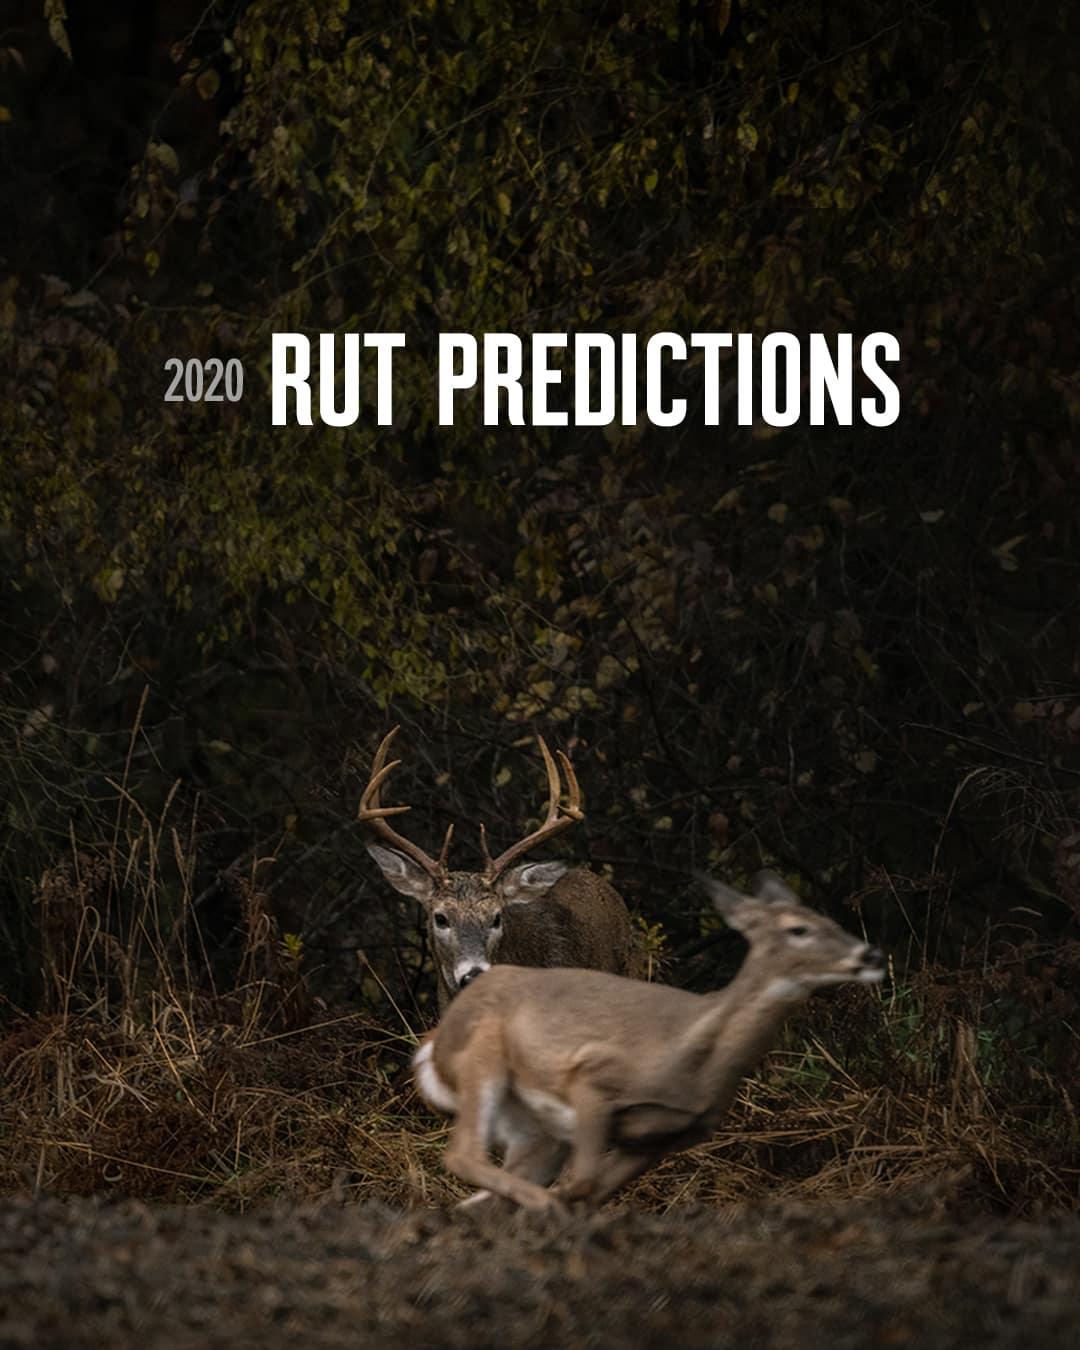 2020 Rut Predictions | Onx Maps for Nys Deer Rut Prediction Dates